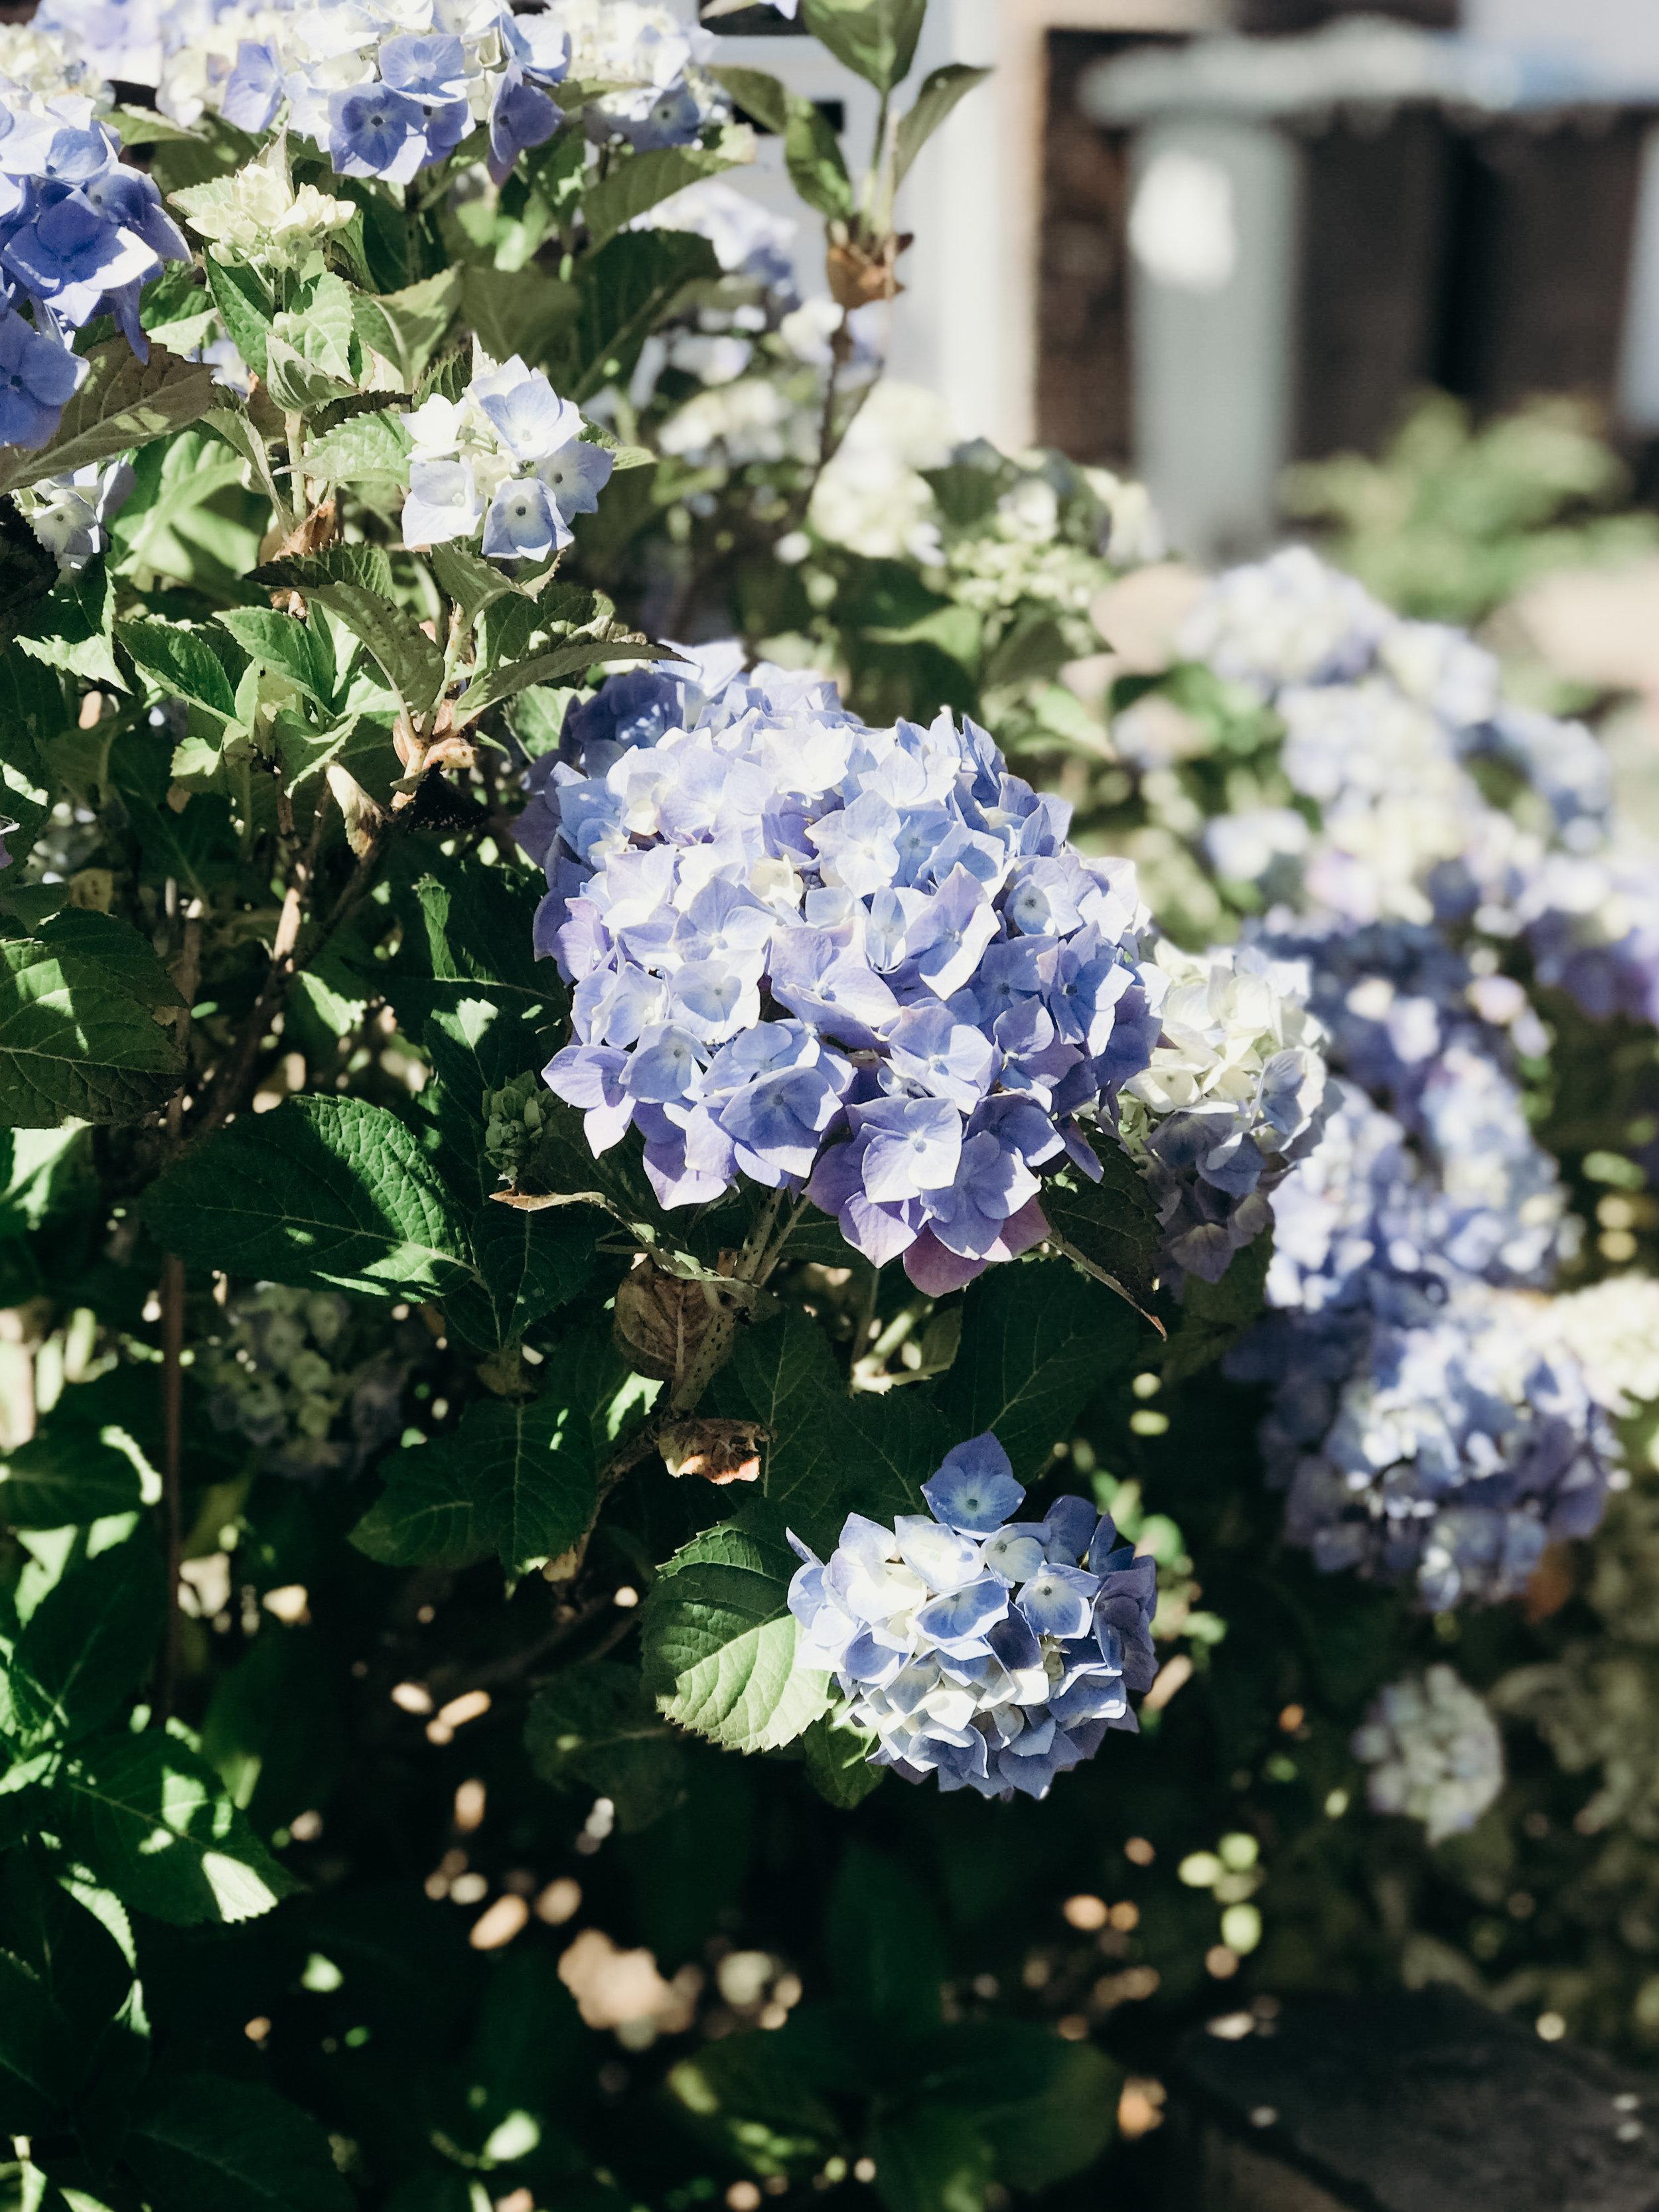 Summer 2018 Highlights - Hydrangeas